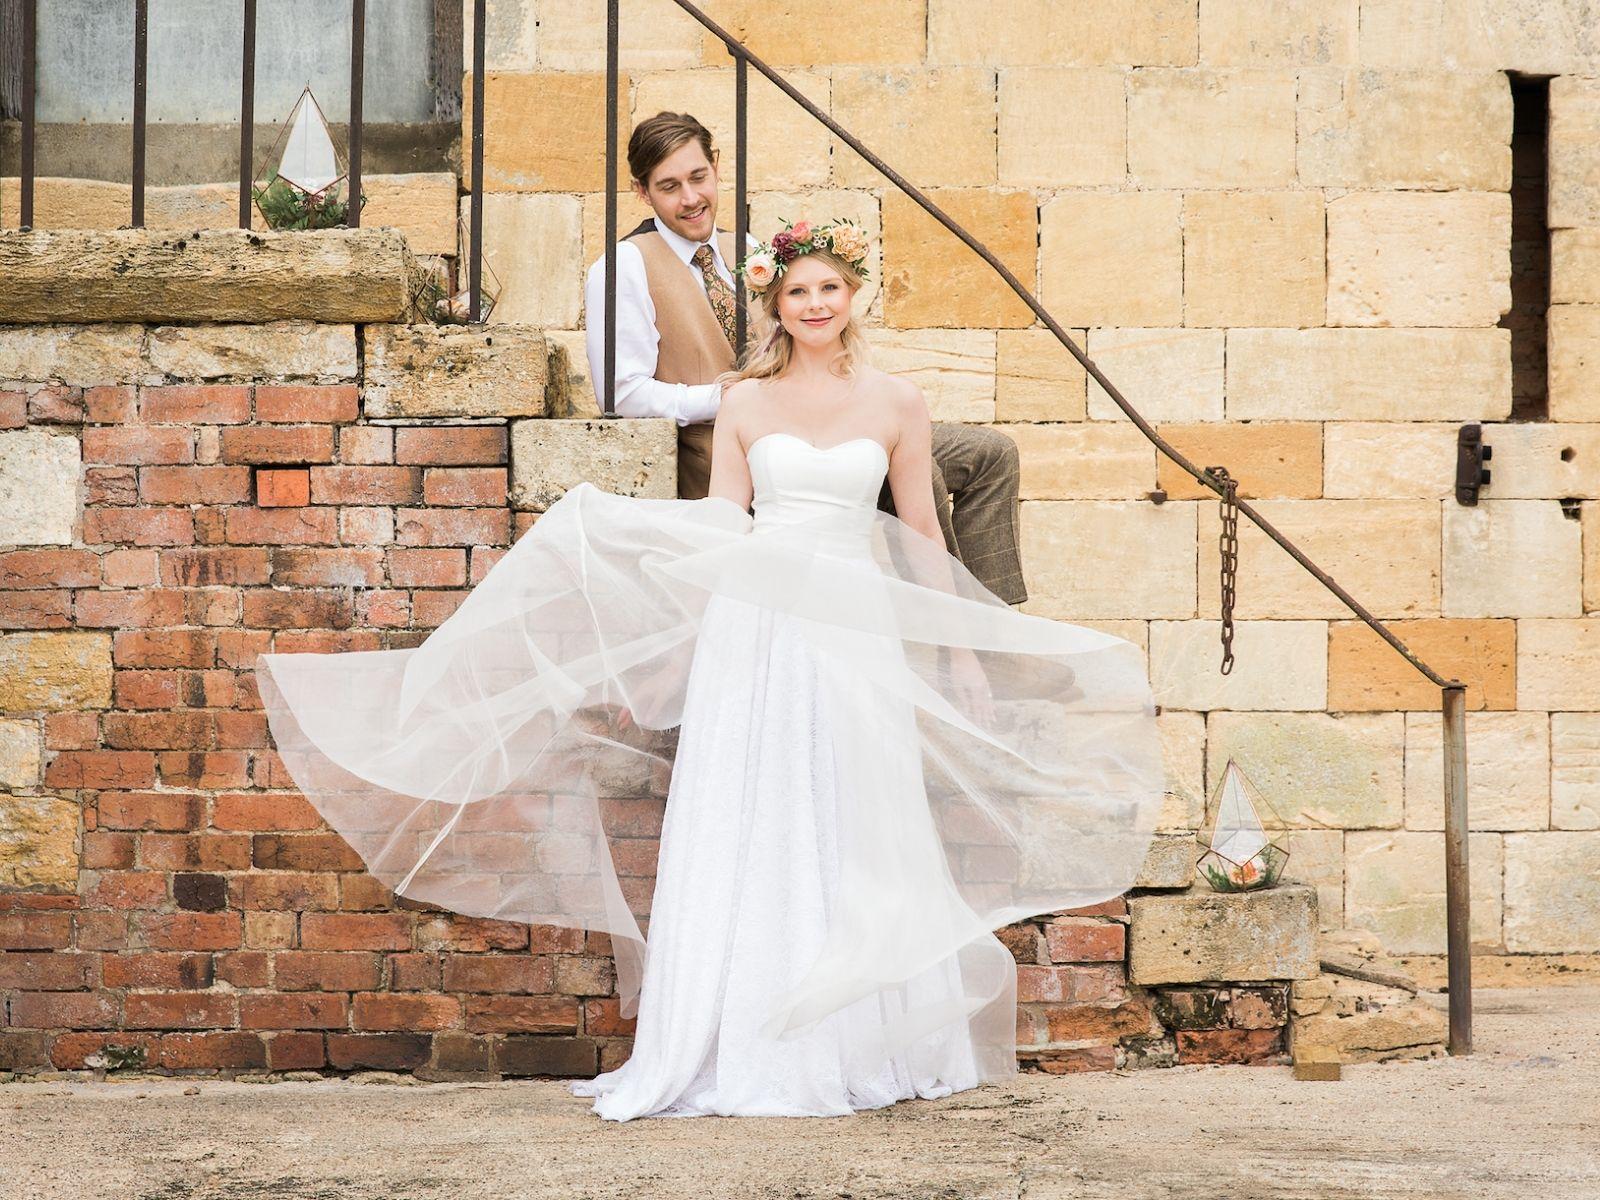 Boho Bride Freedom Collection boho wedding dresses Stratford Upon Avon